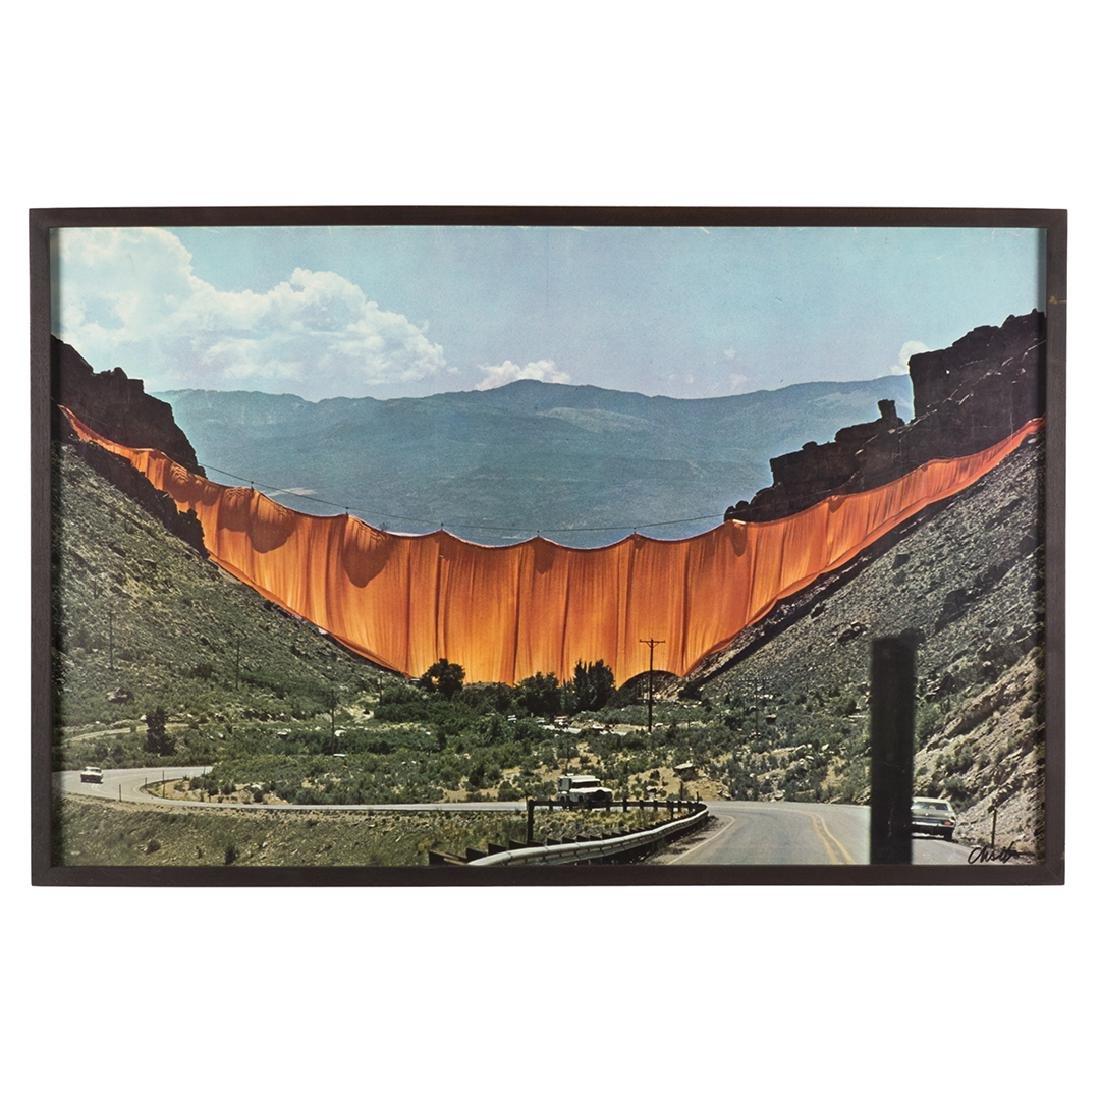 Christo 'Valley Curtain, Rifle Colorado' Offset Print